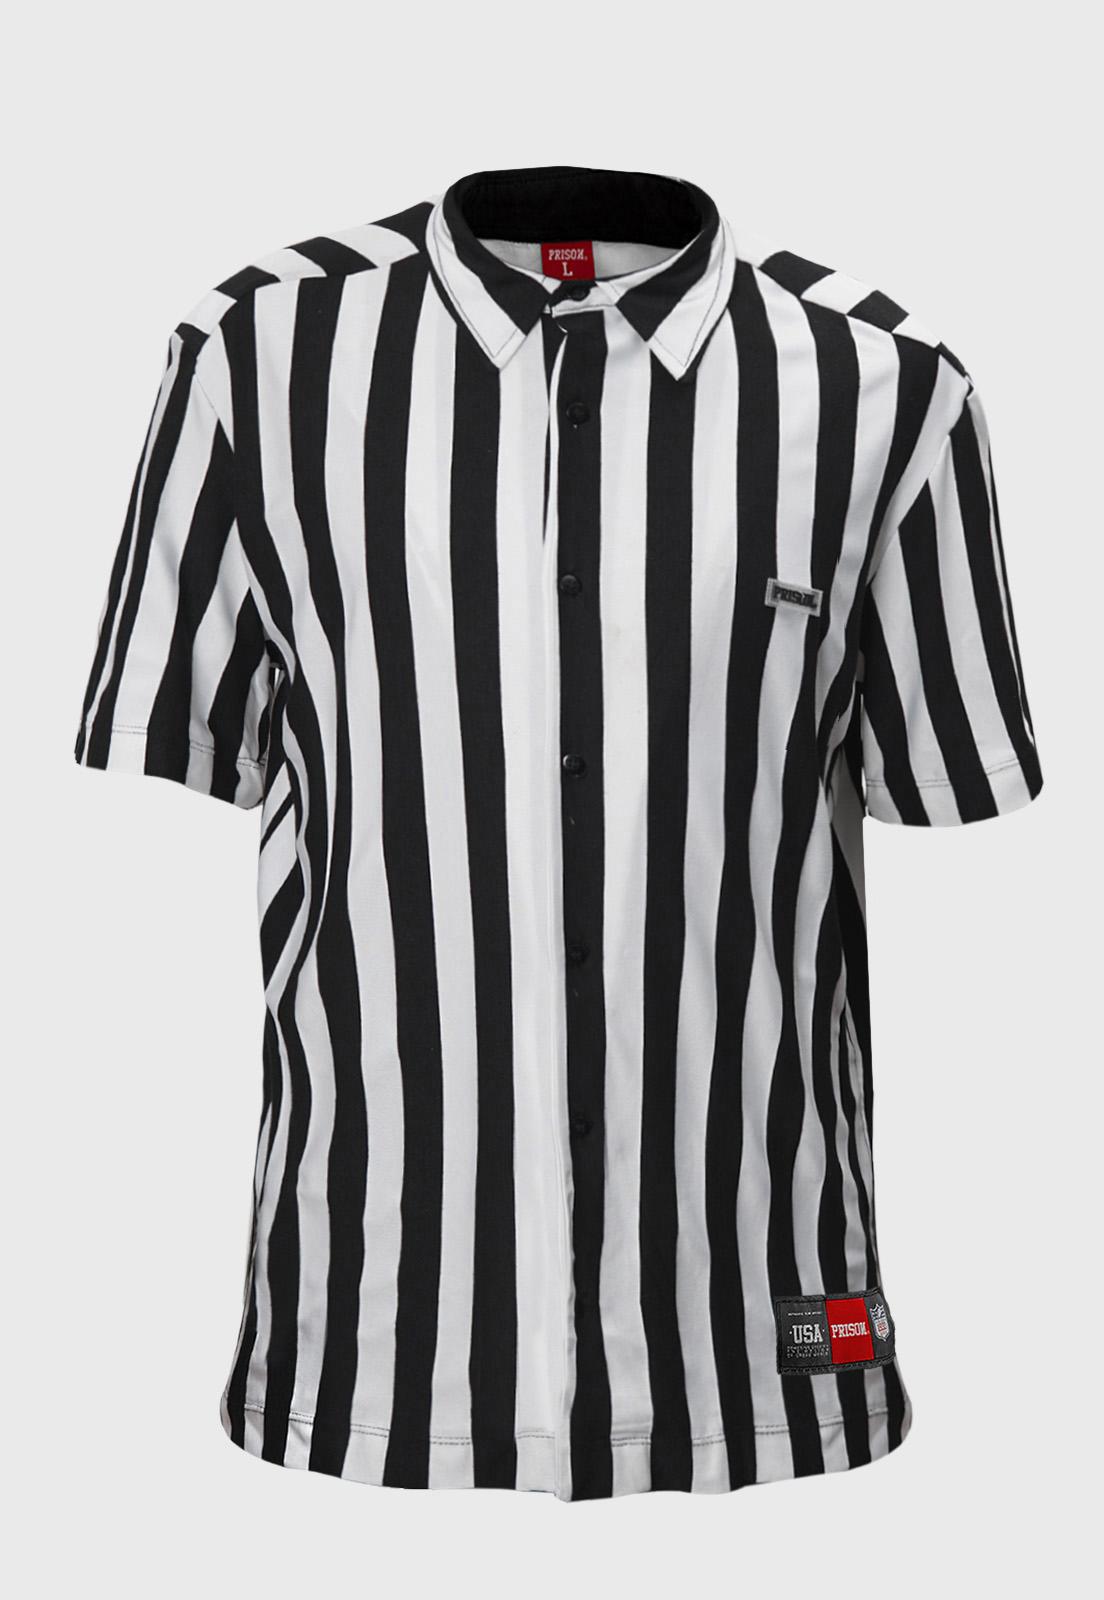 Camisa social Prison listrado Black and White